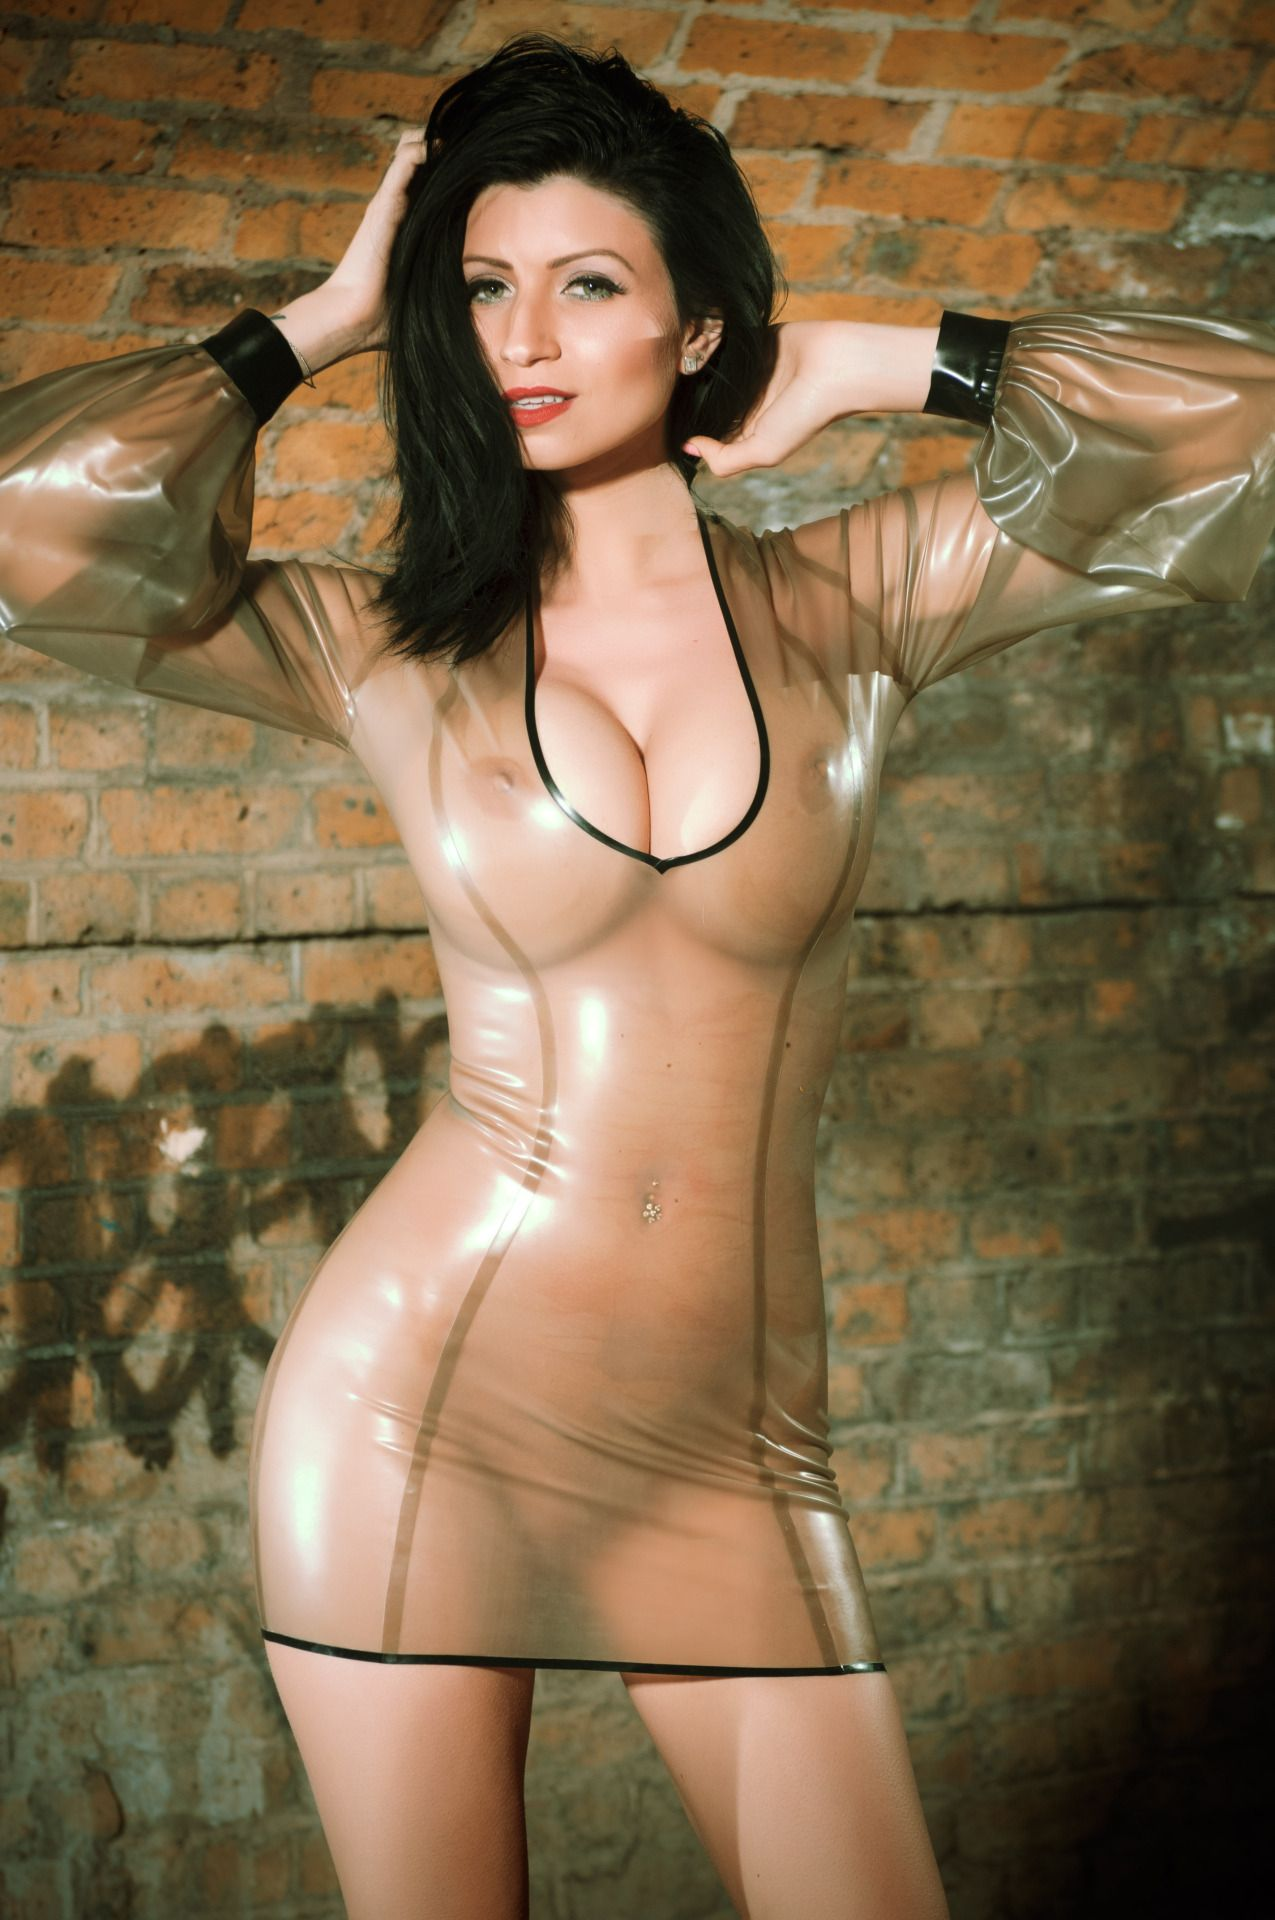 Swimwear Nude Vinal Images